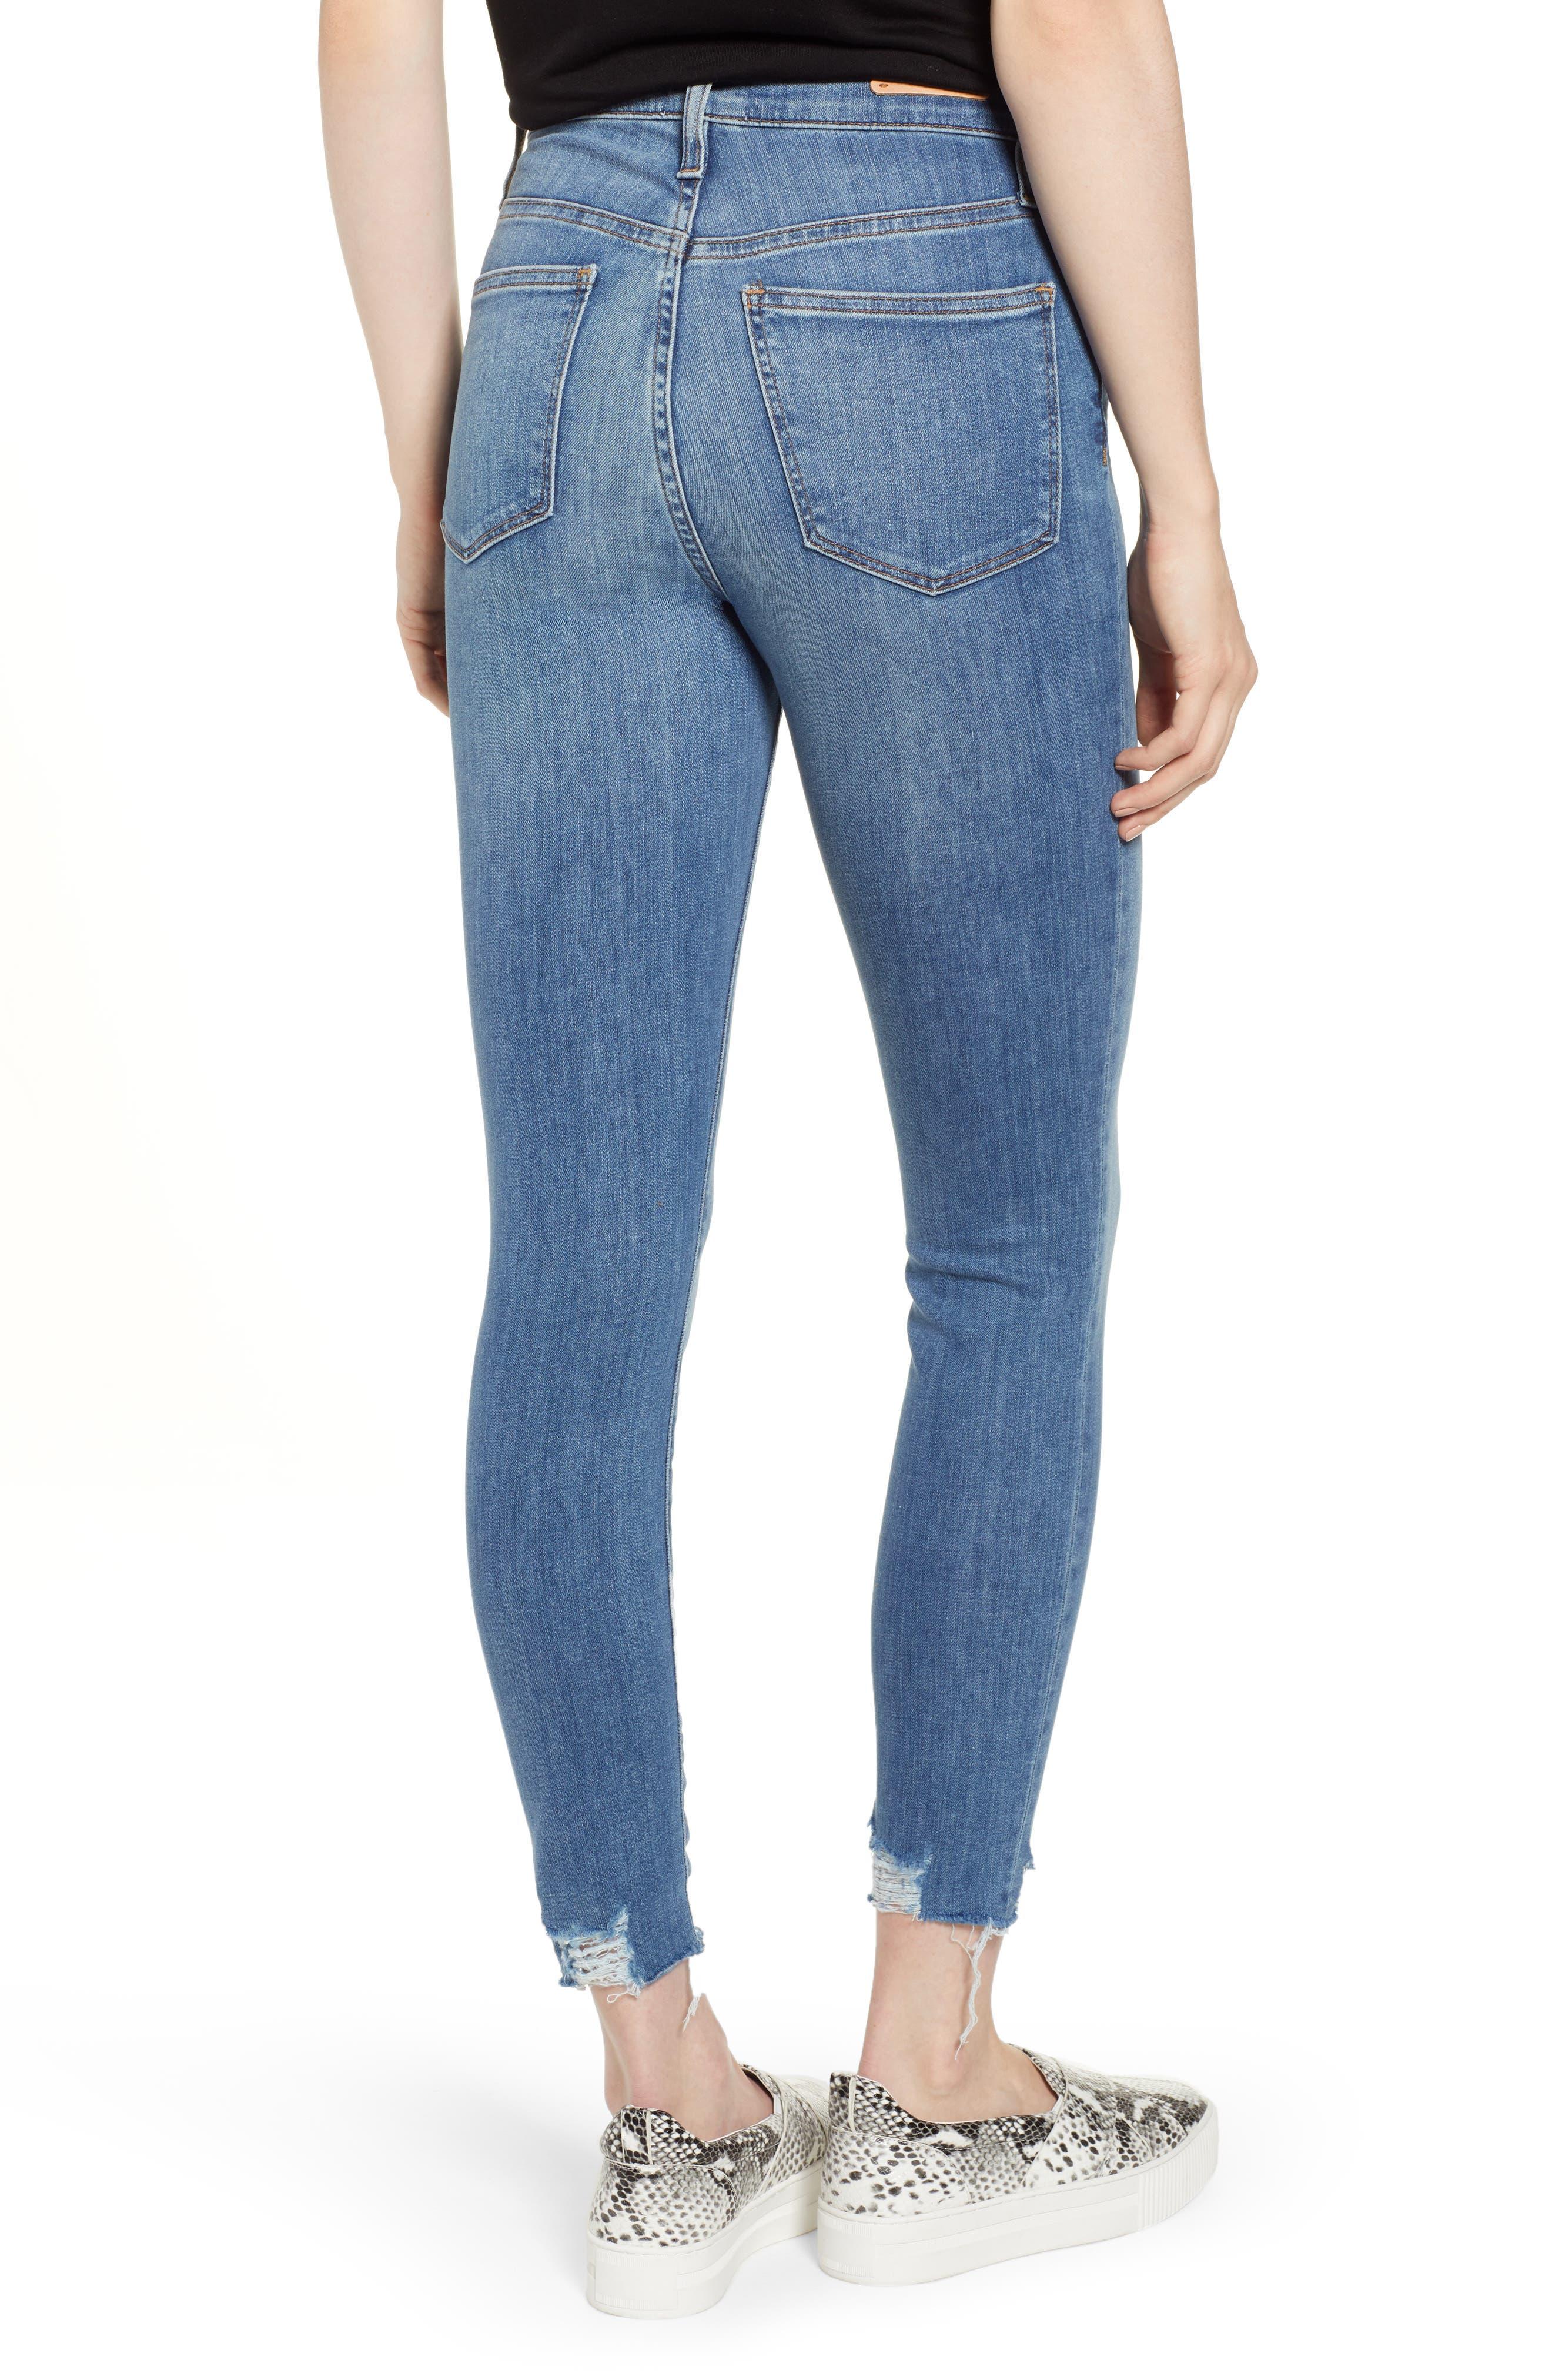 Sierra High Waist Raw Hem Skinny Jeans,                             Alternate thumbnail 2, color,                             NORIKO